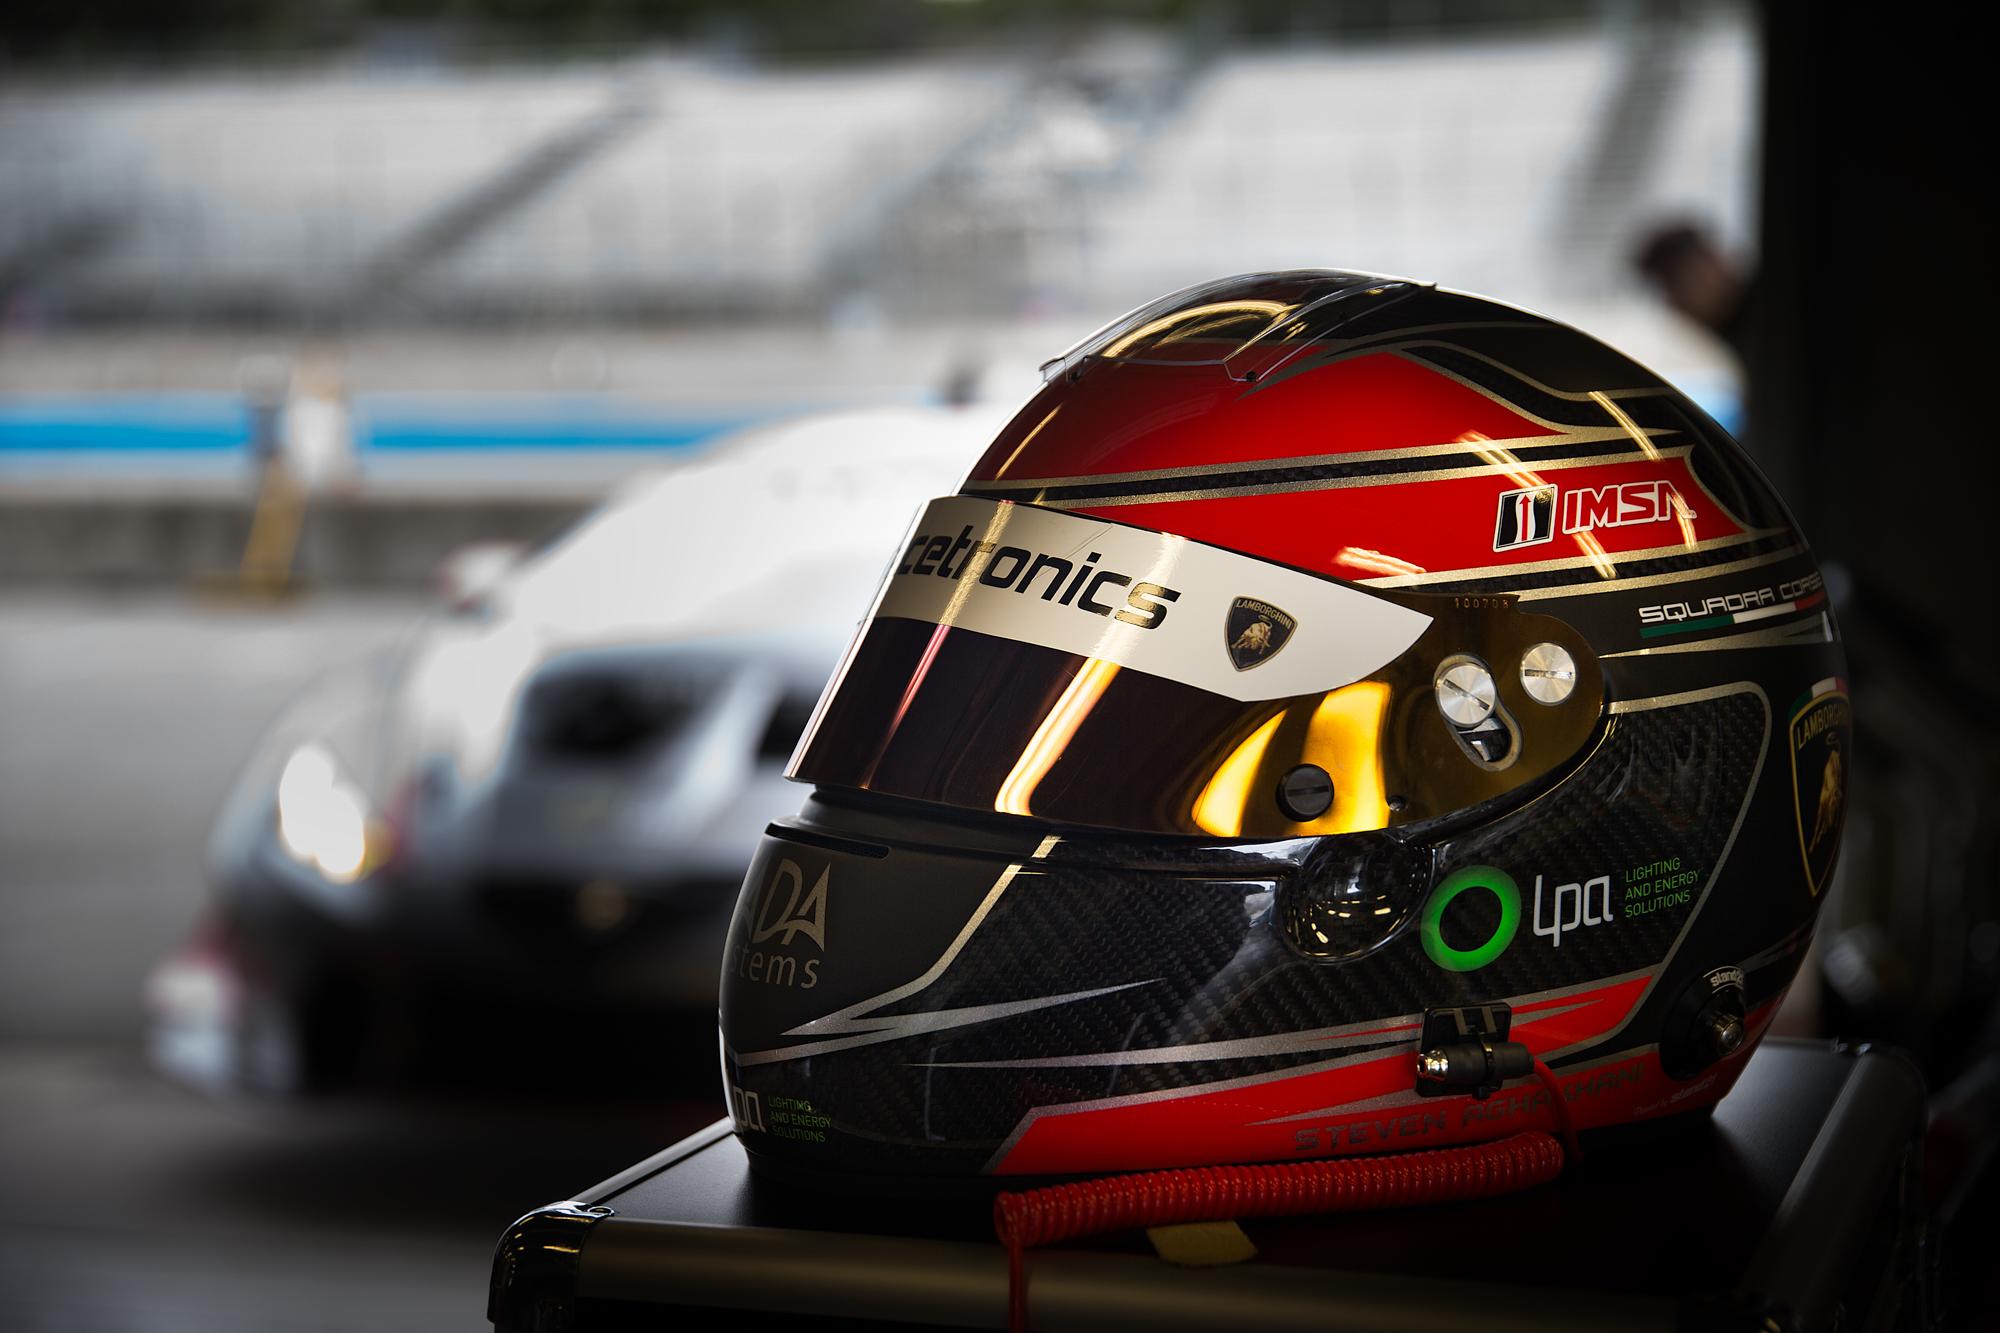 Steven-Racing-Laguna-20180531-96064.jpg